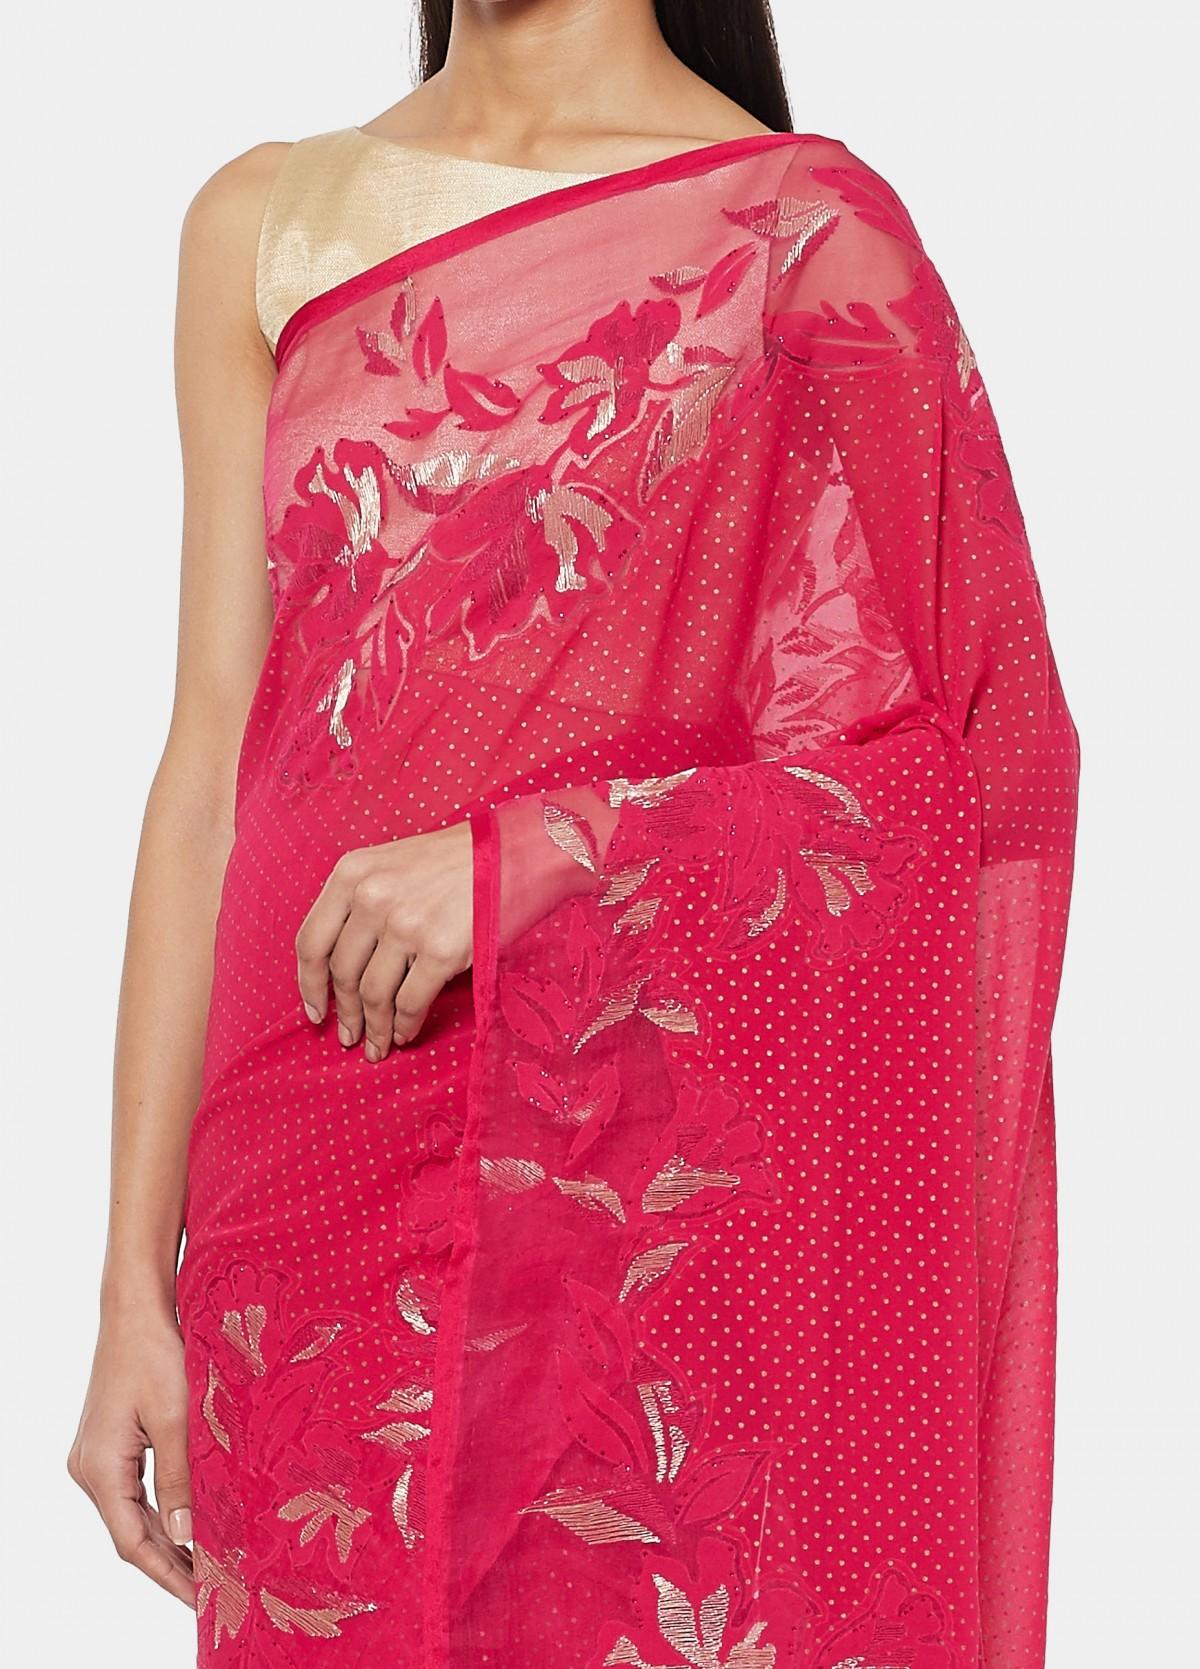 The Blossom Sari